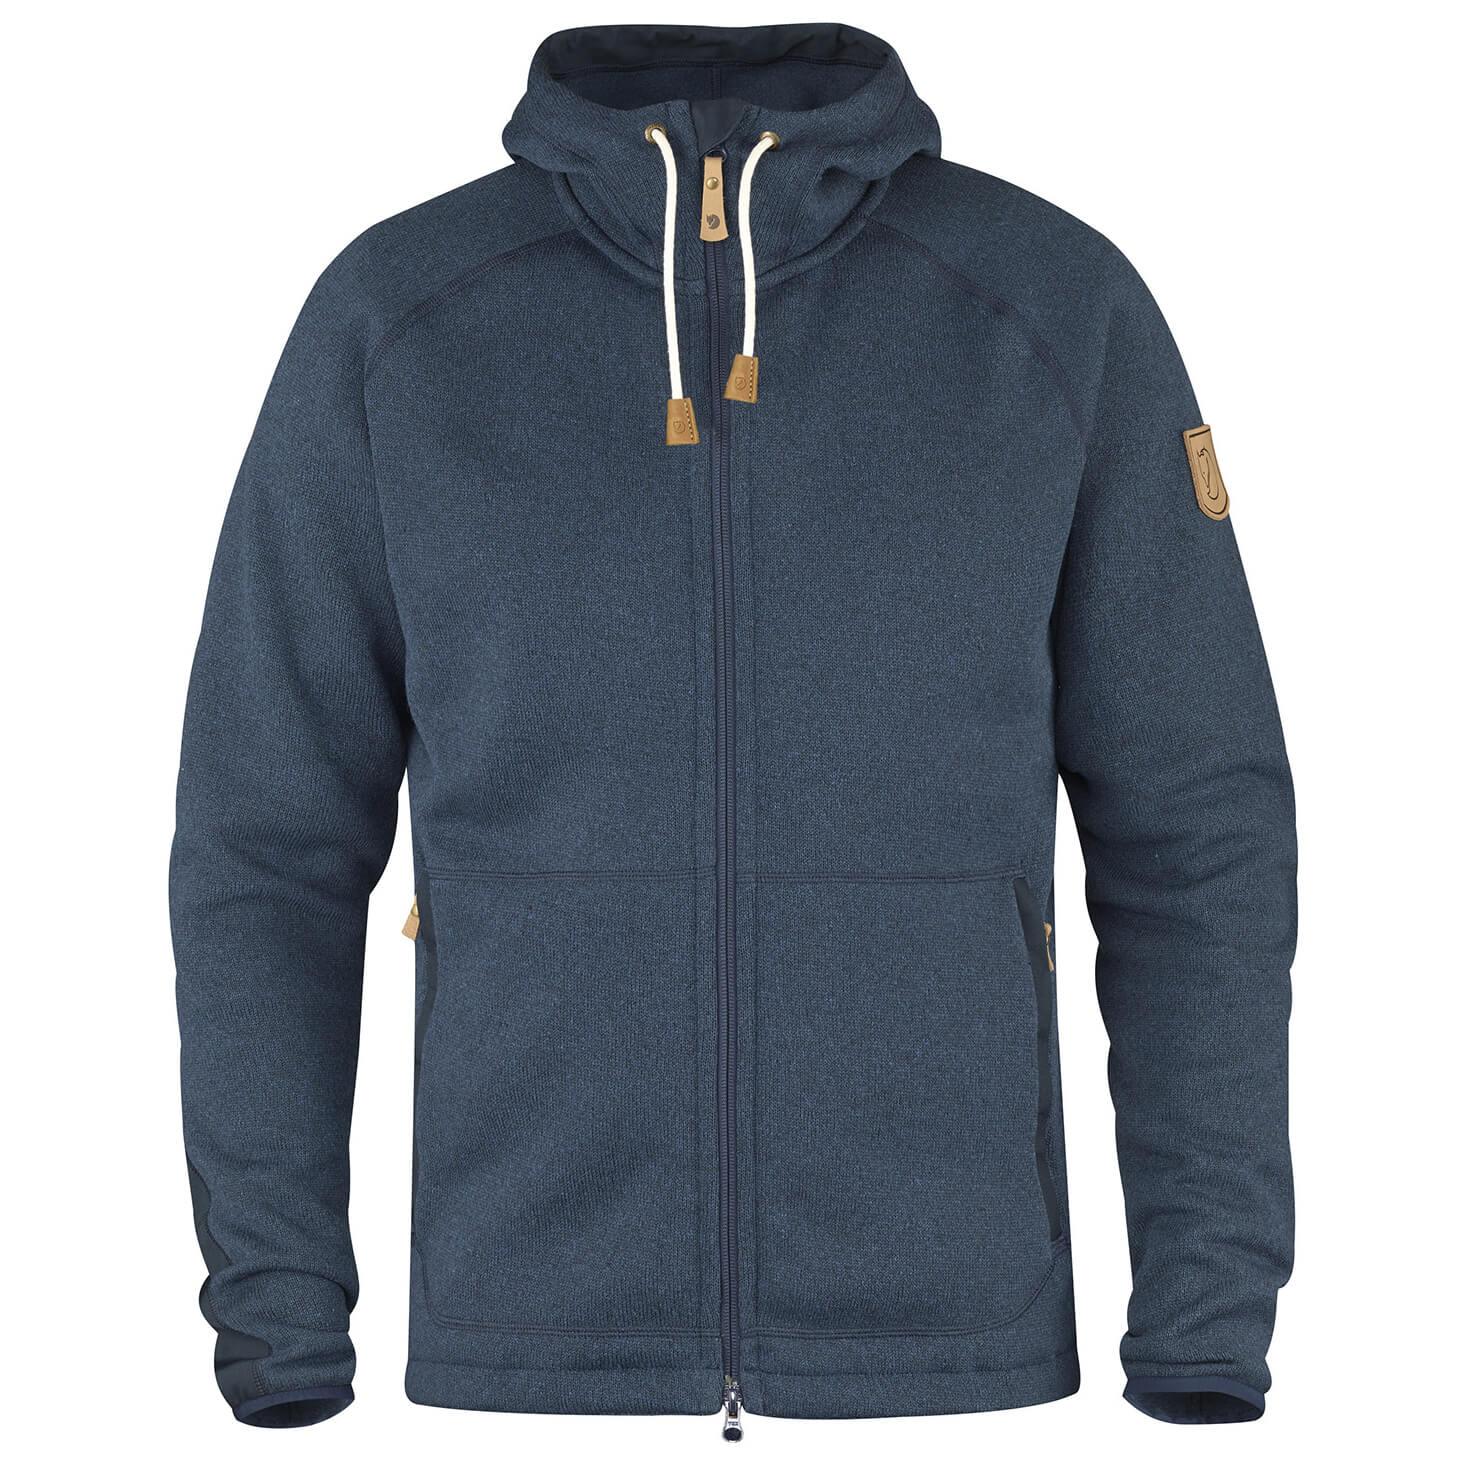 neues so billig anders Fjällräven - Övik Fleece Hoodie - Fleecejacke - Navy | XS